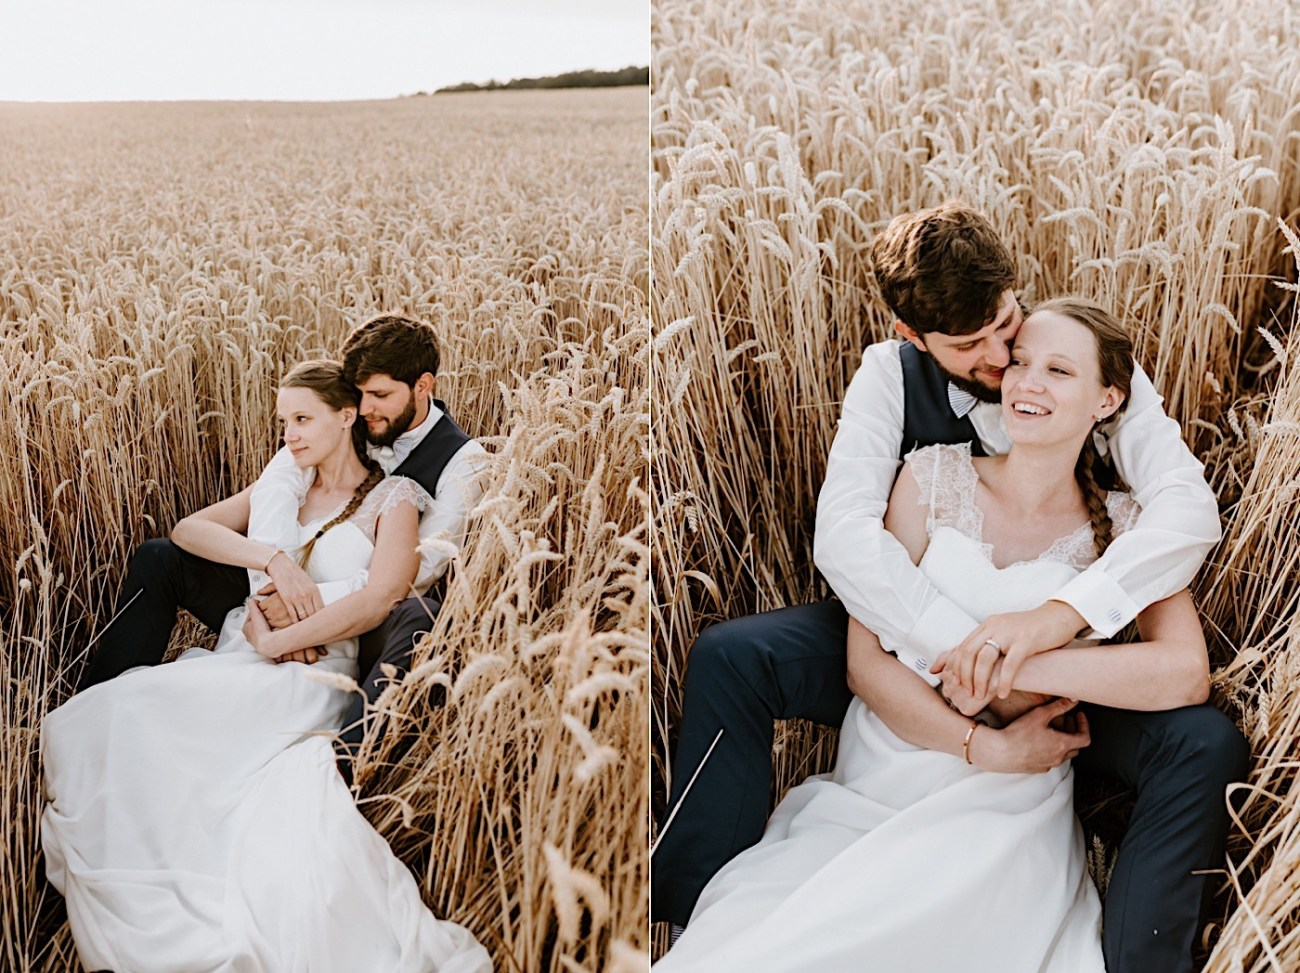 France Wedding Wheat Field Wedding Photos Paris Wedding Photographer 026